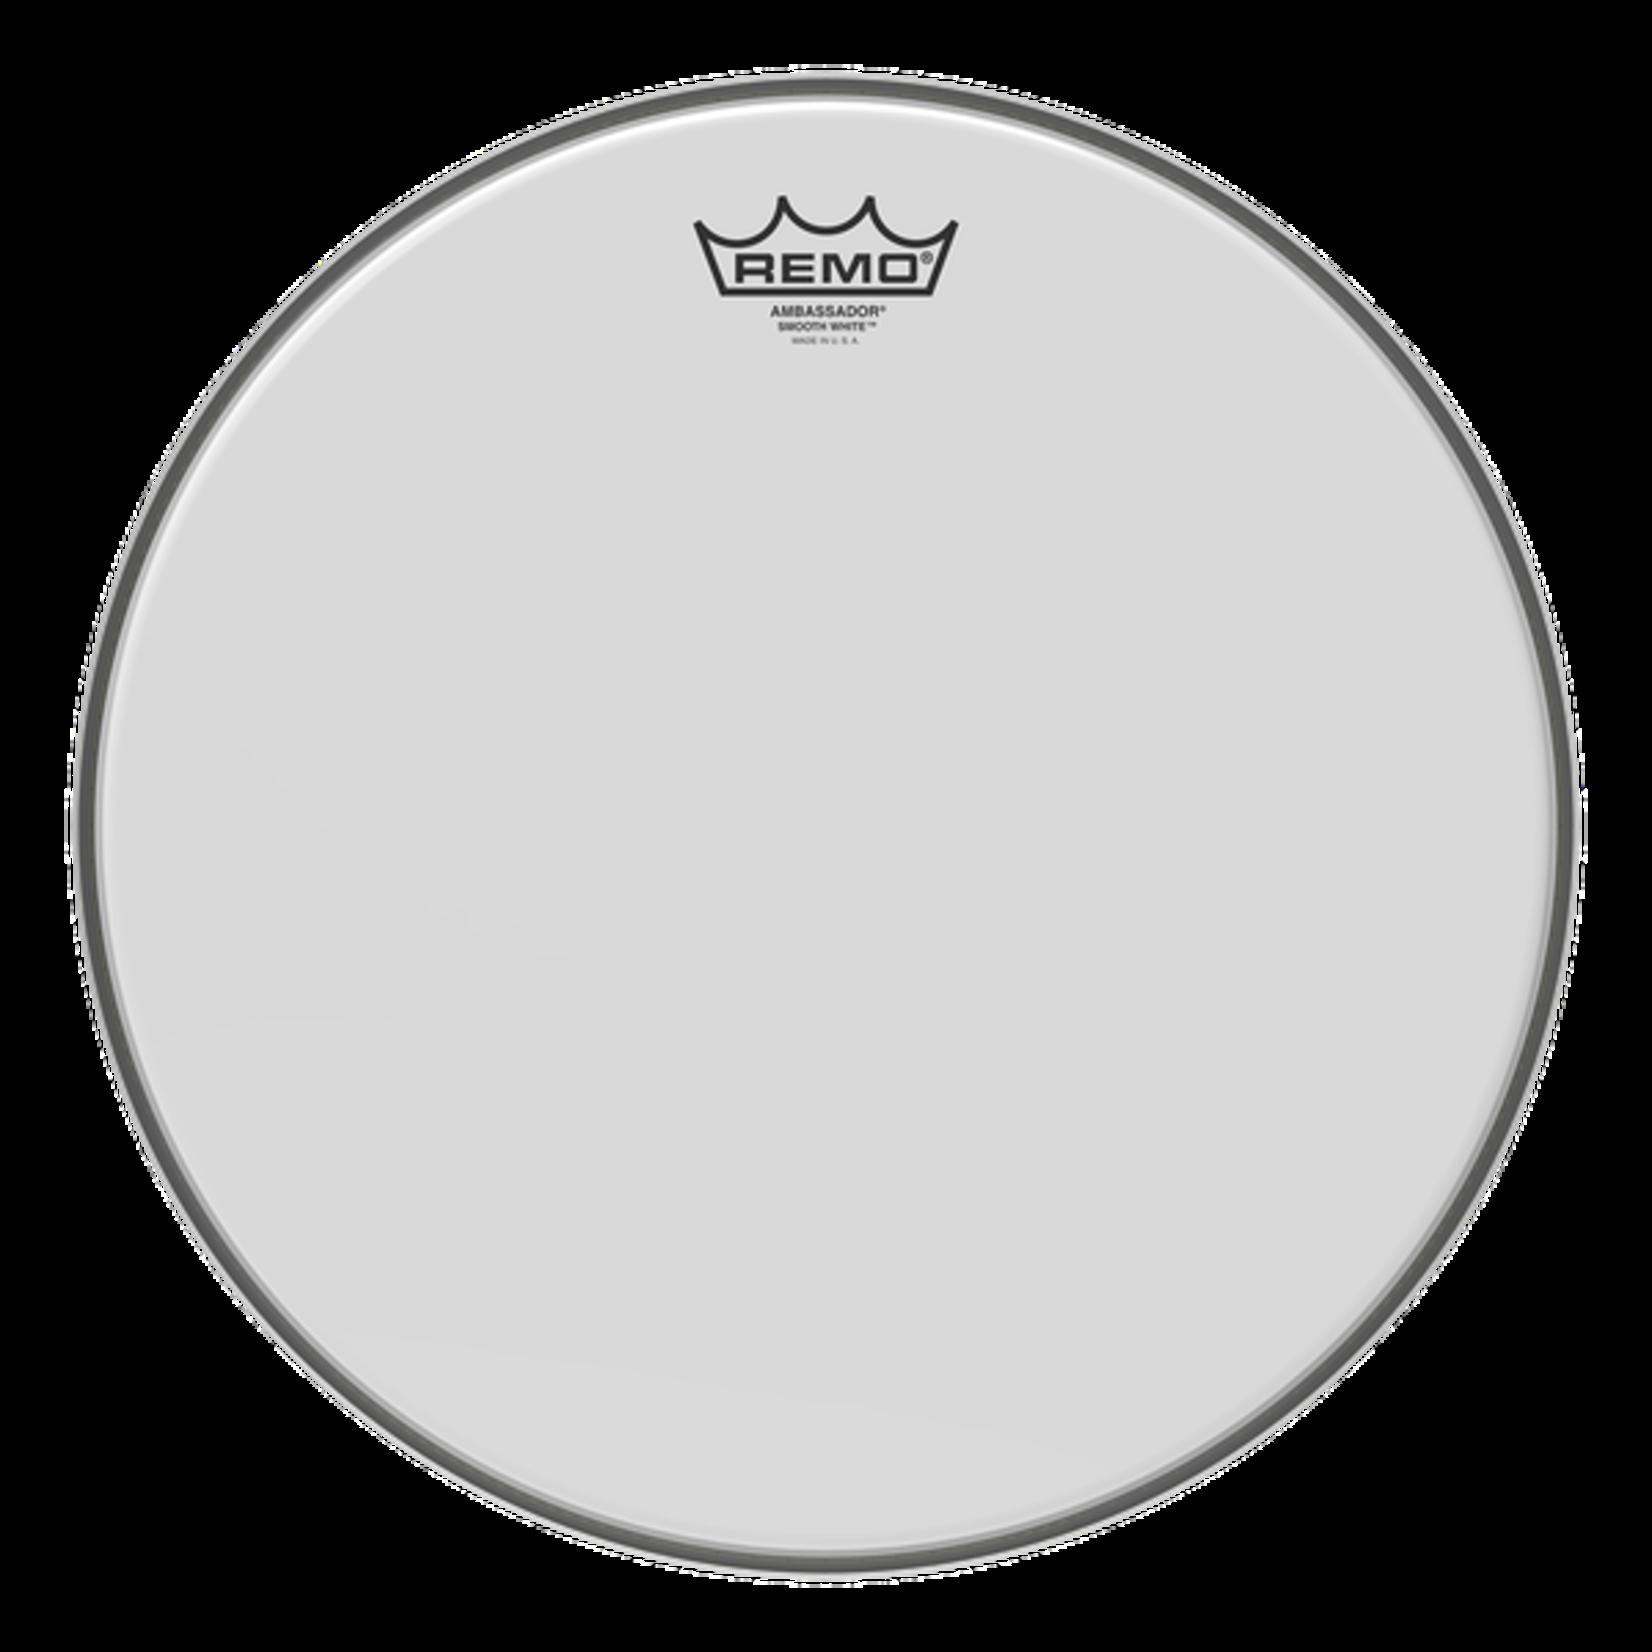 Remo Remo Smooth White Ambassador Bass Drum